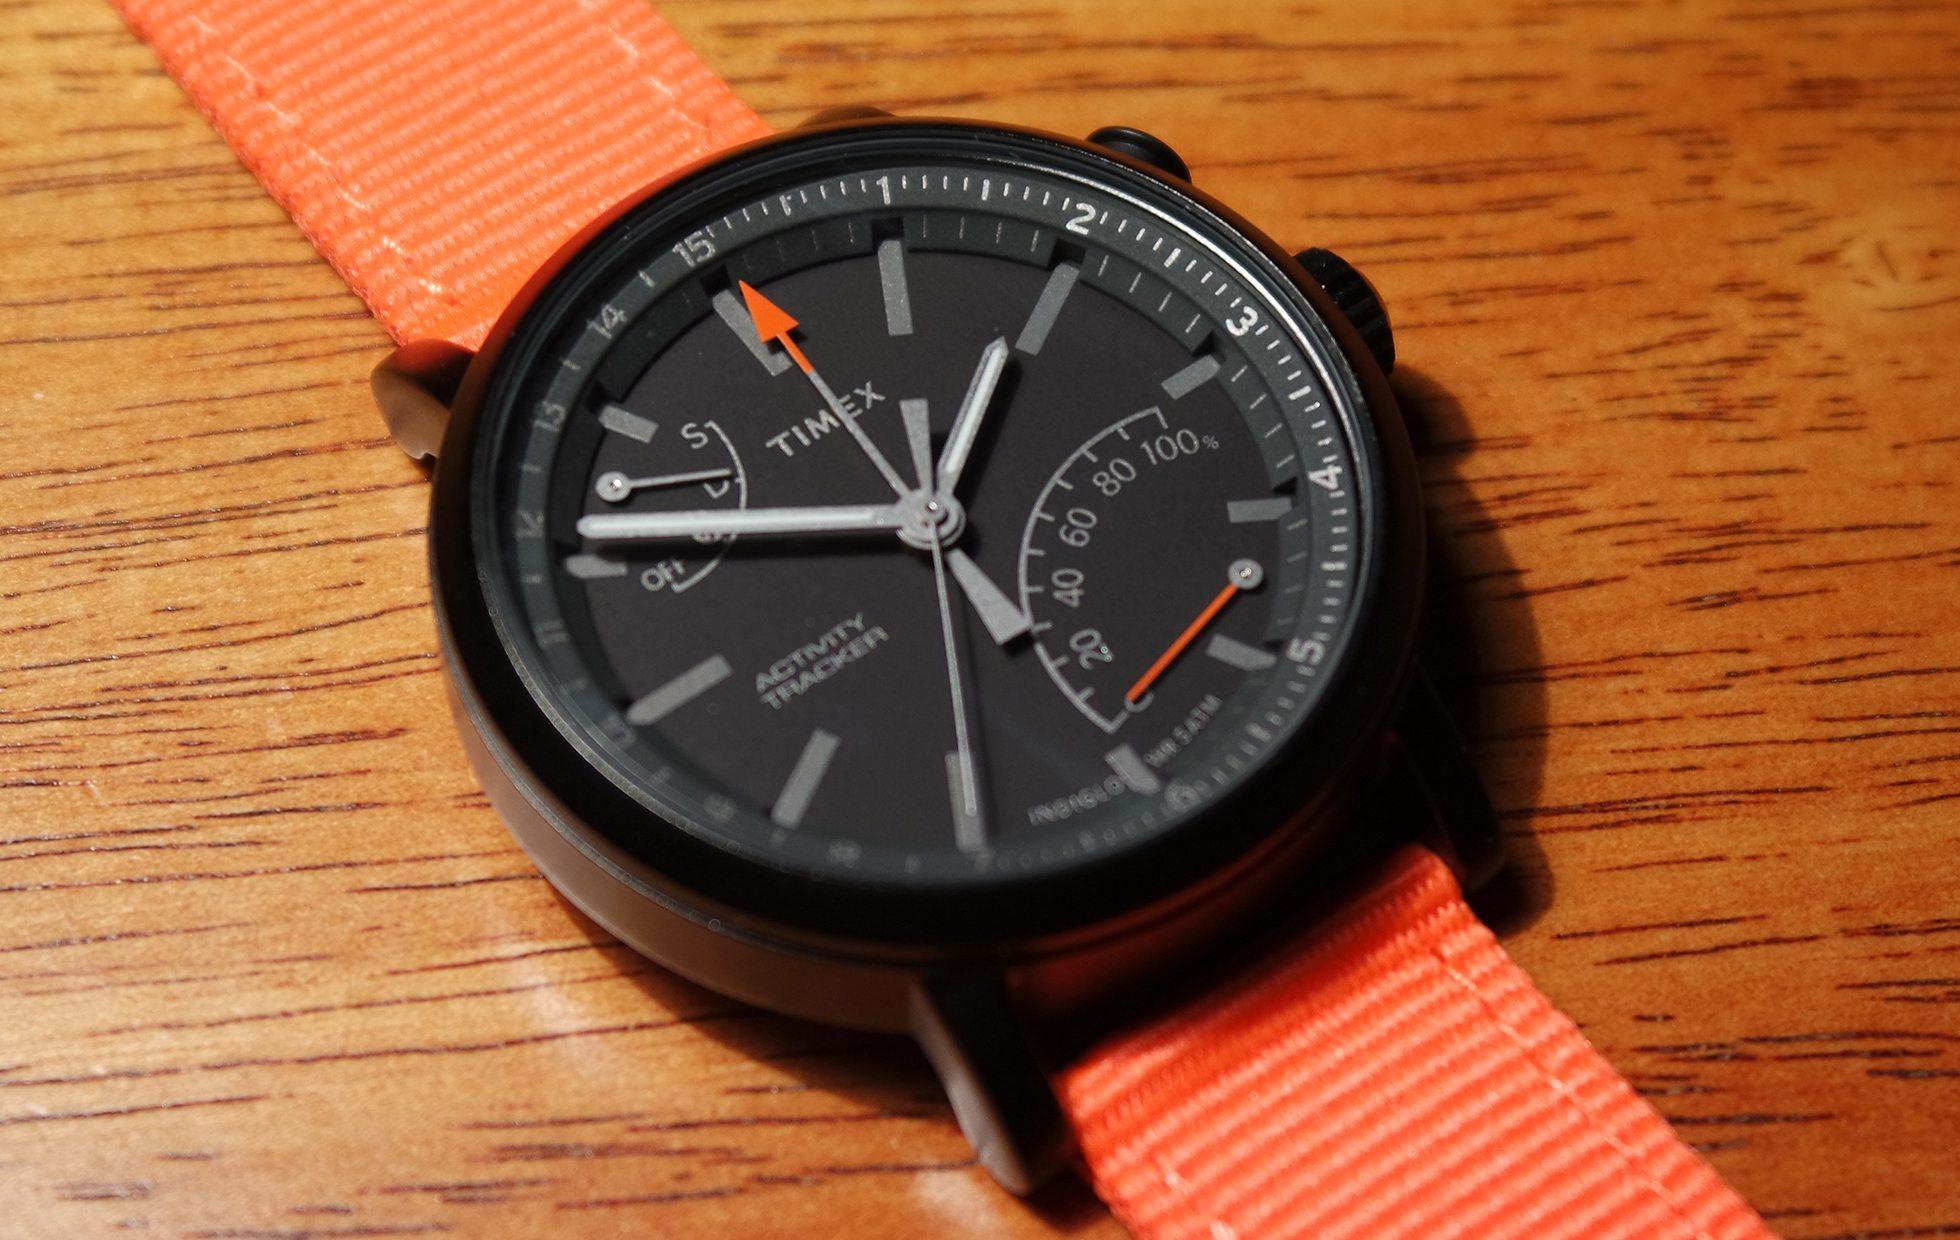 d858b04b7472 Review  Metropolitan+ un Timex análogo con alma digital